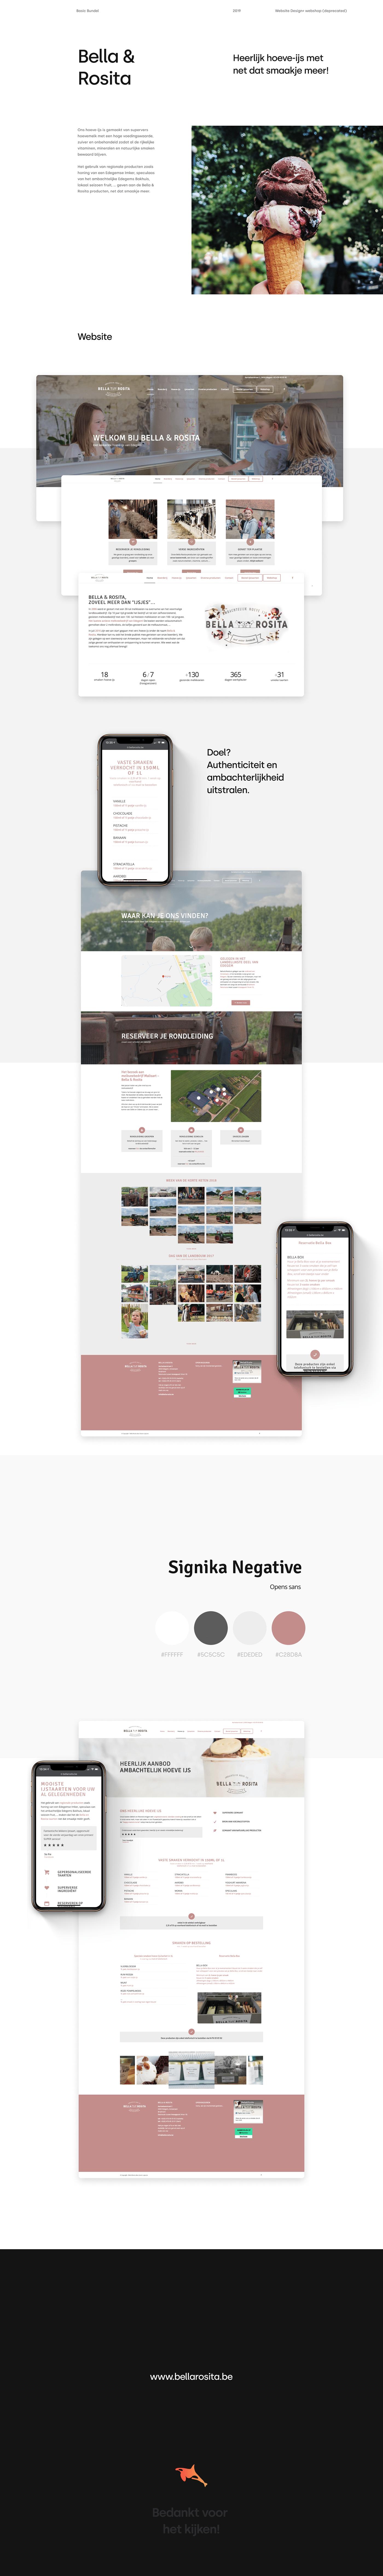 design icecream minimal minimal design minimal website shop